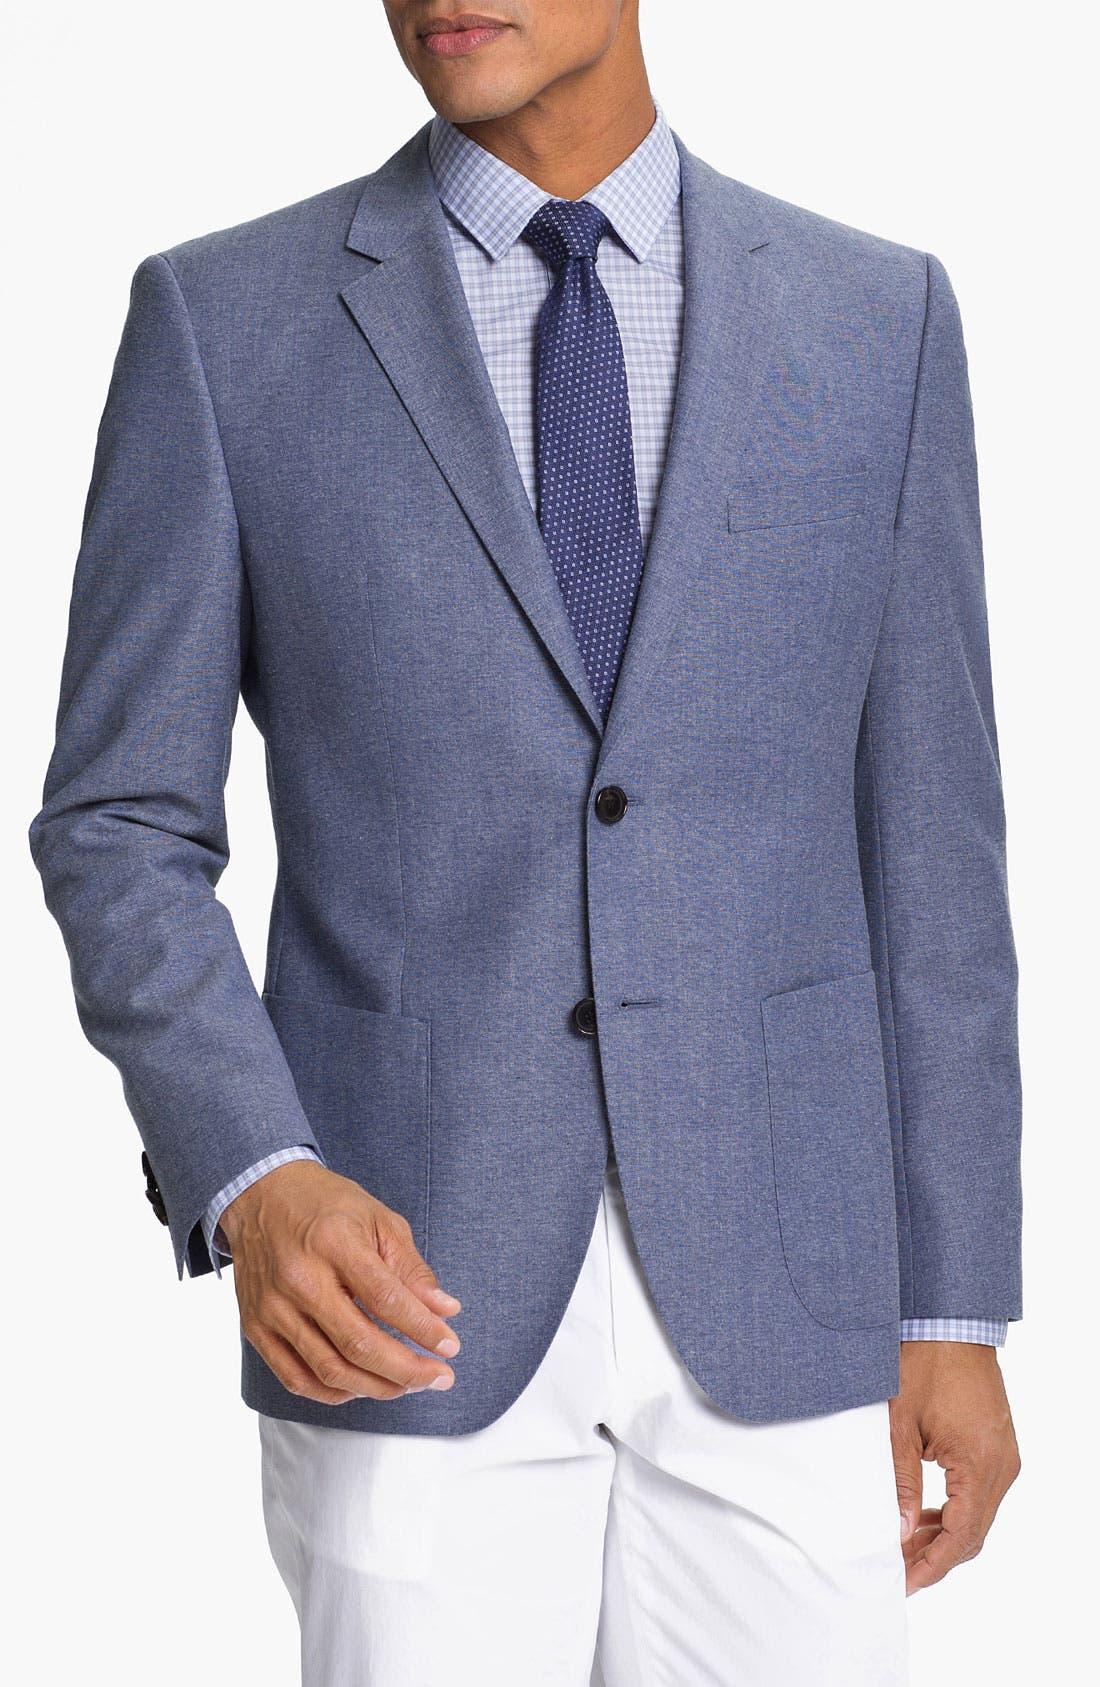 Main Image - BOSS HUGO BOSS 'Jesse' Trim Fit Cotton Blend Blazer